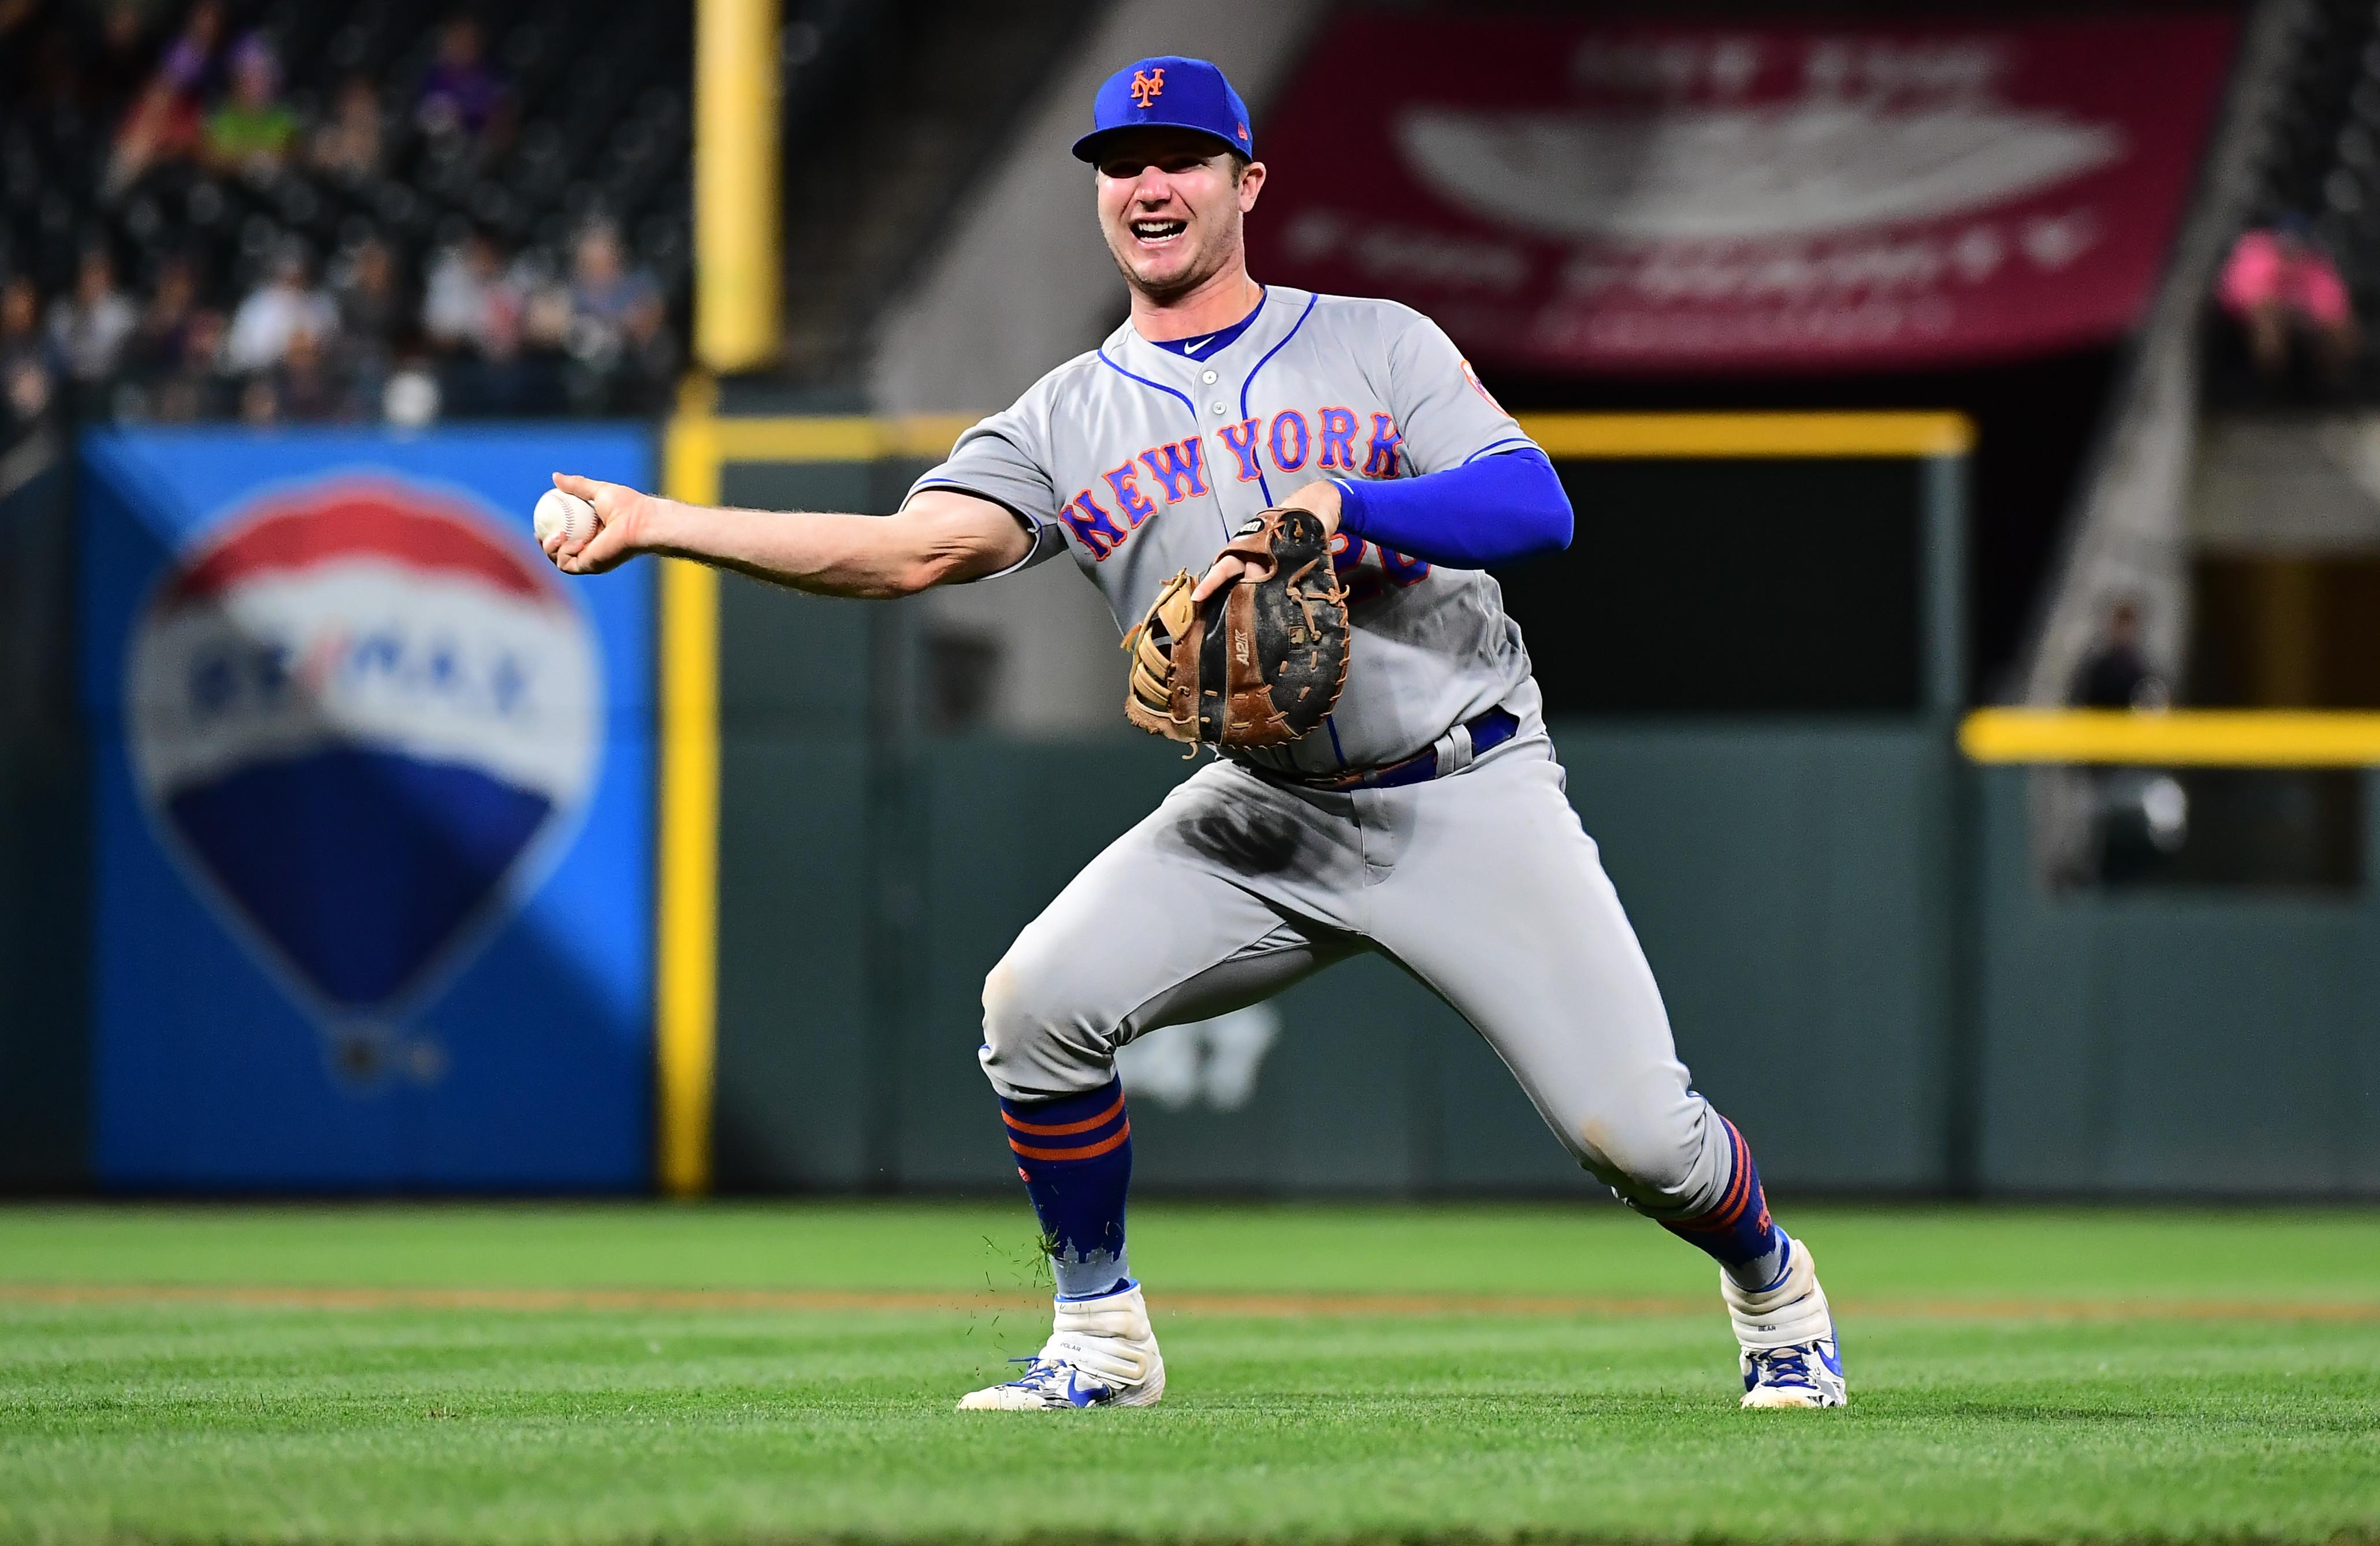 9/17/19 Game Preview: New York Mets at Colorado Rockies